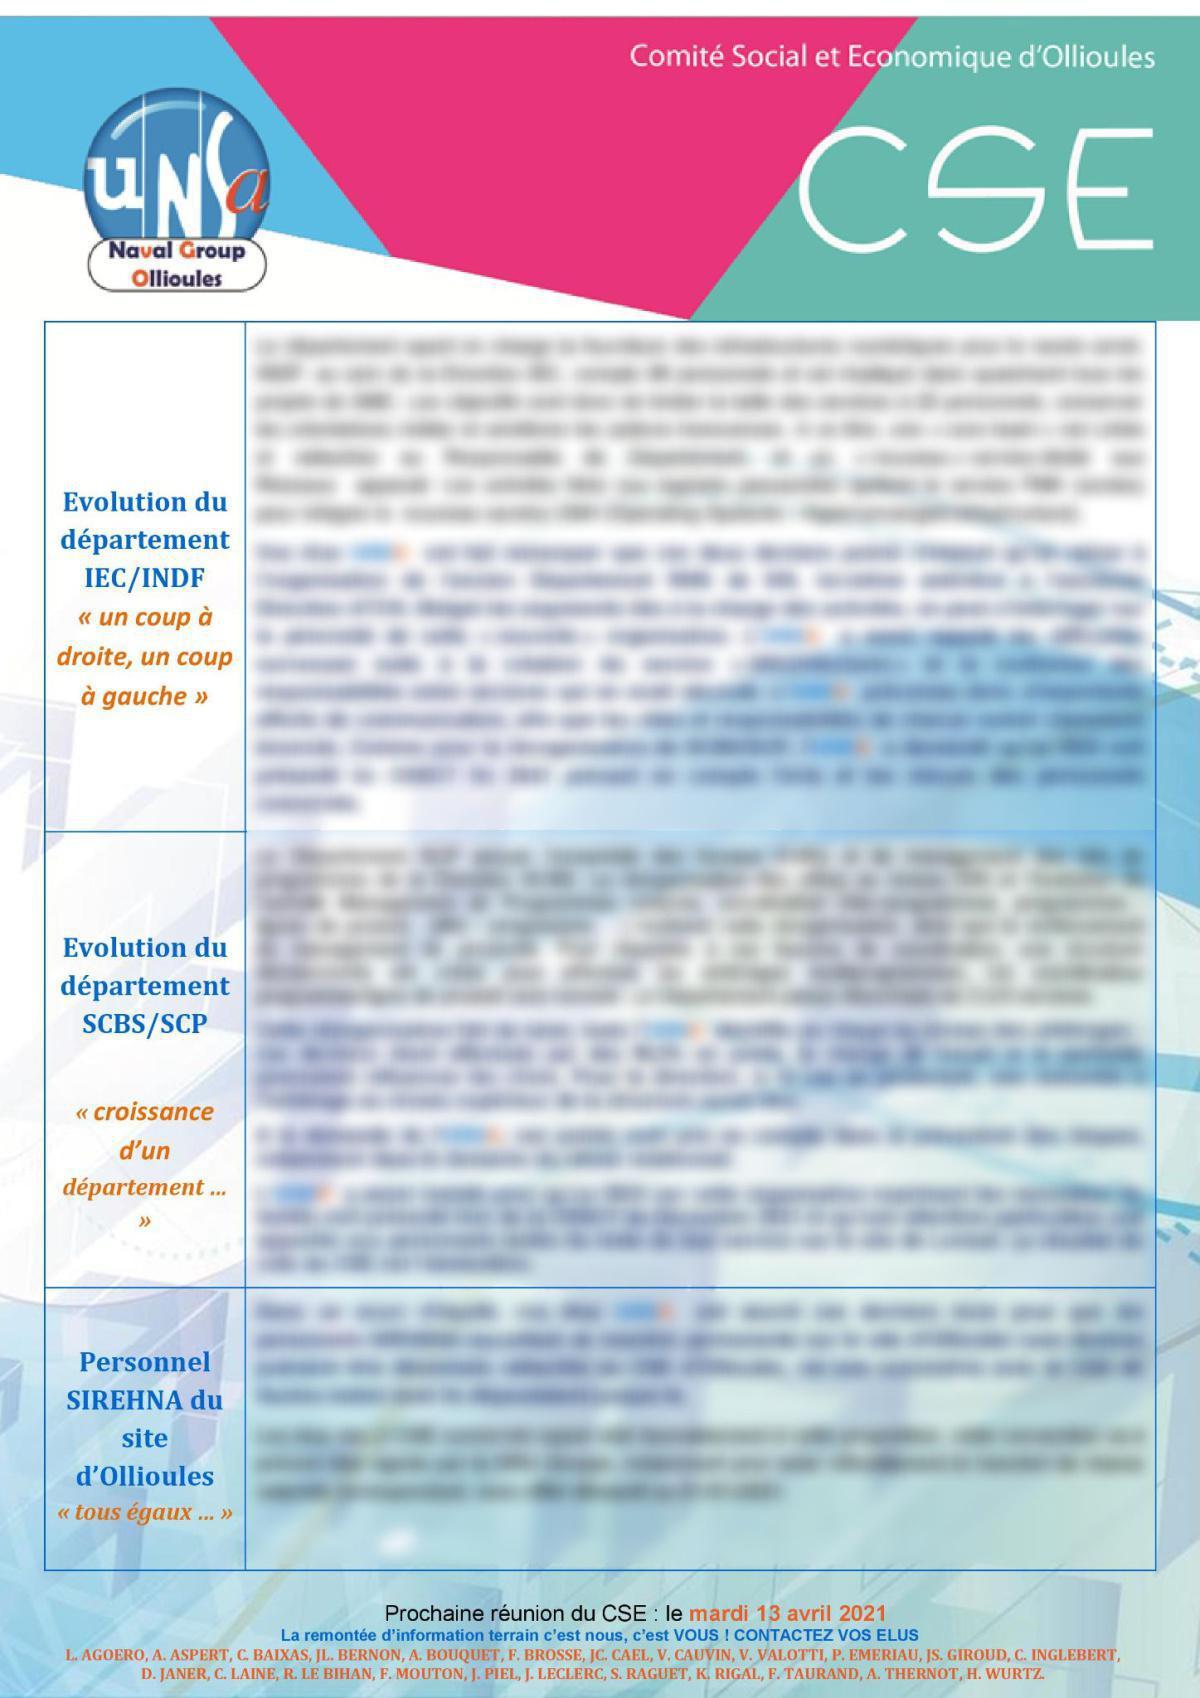 CSE d'Ollioules - réunion du 9 mars 2021